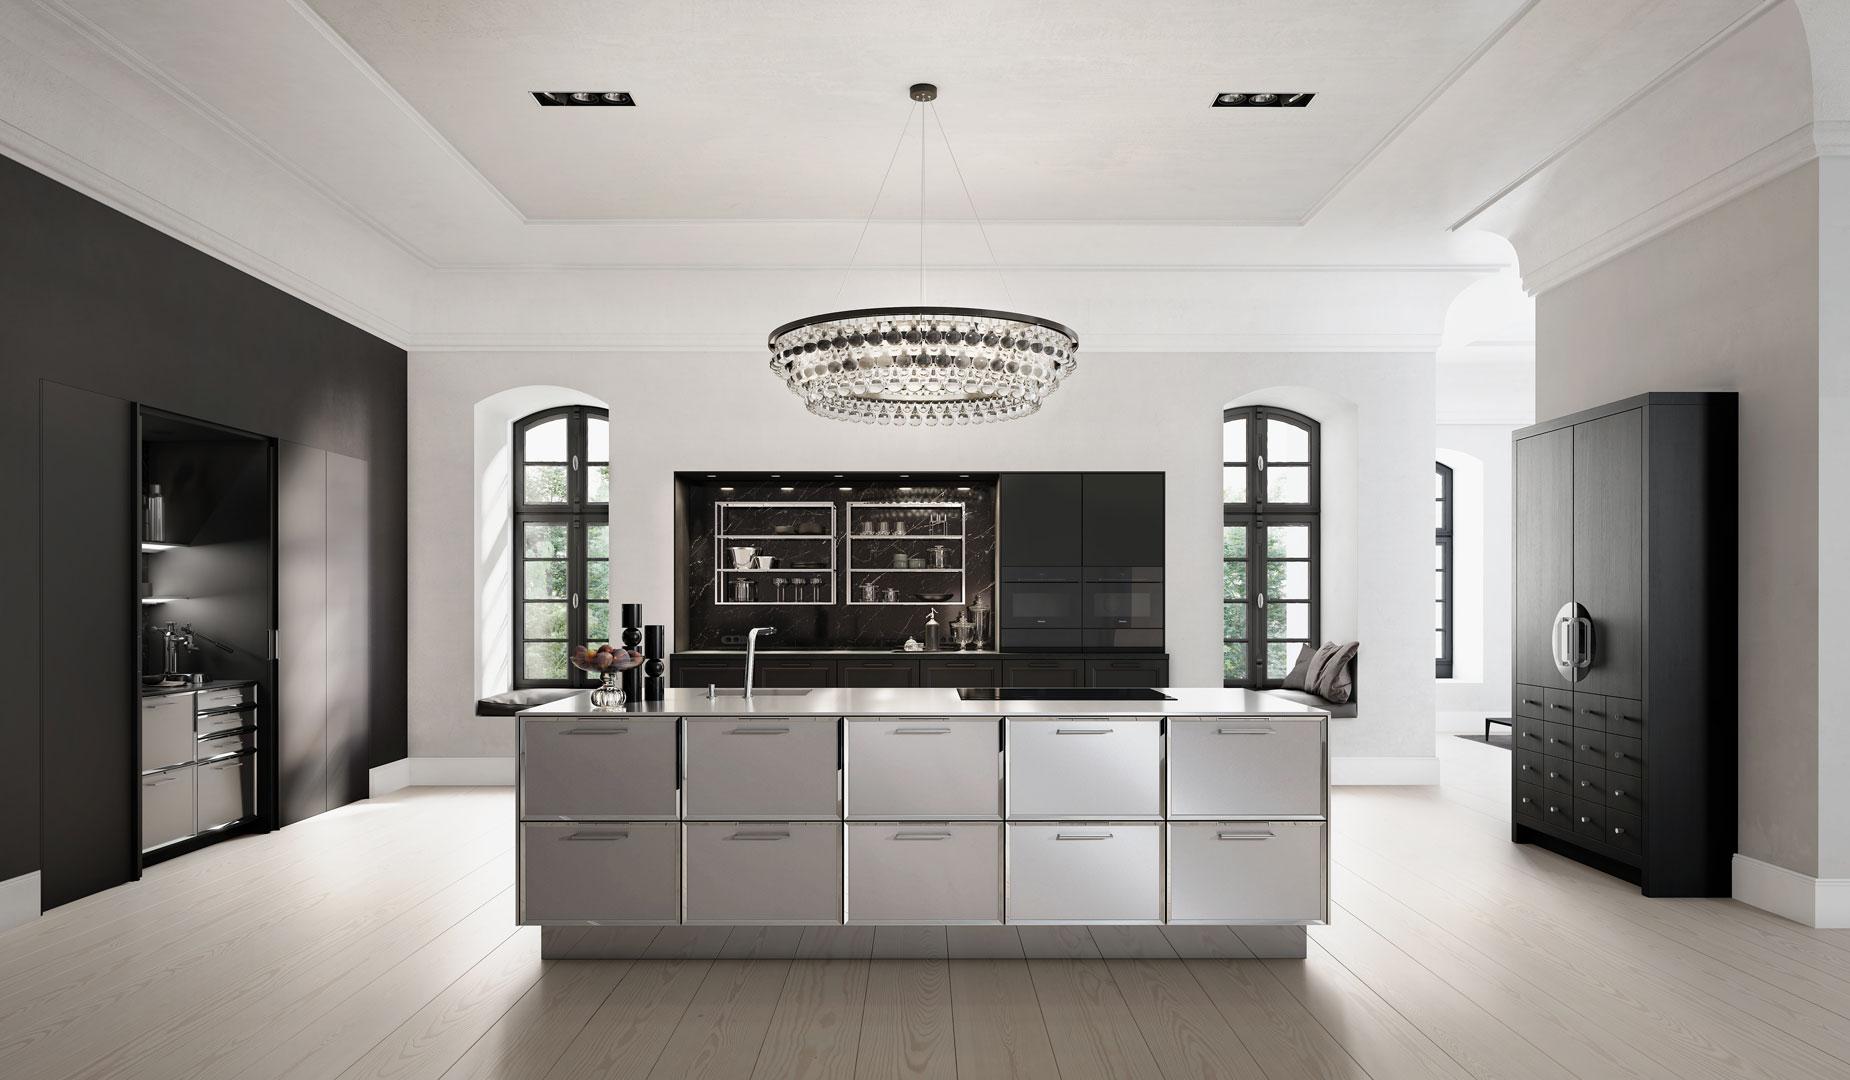 siematic am ring arcade kitchens. Black Bedroom Furniture Sets. Home Design Ideas